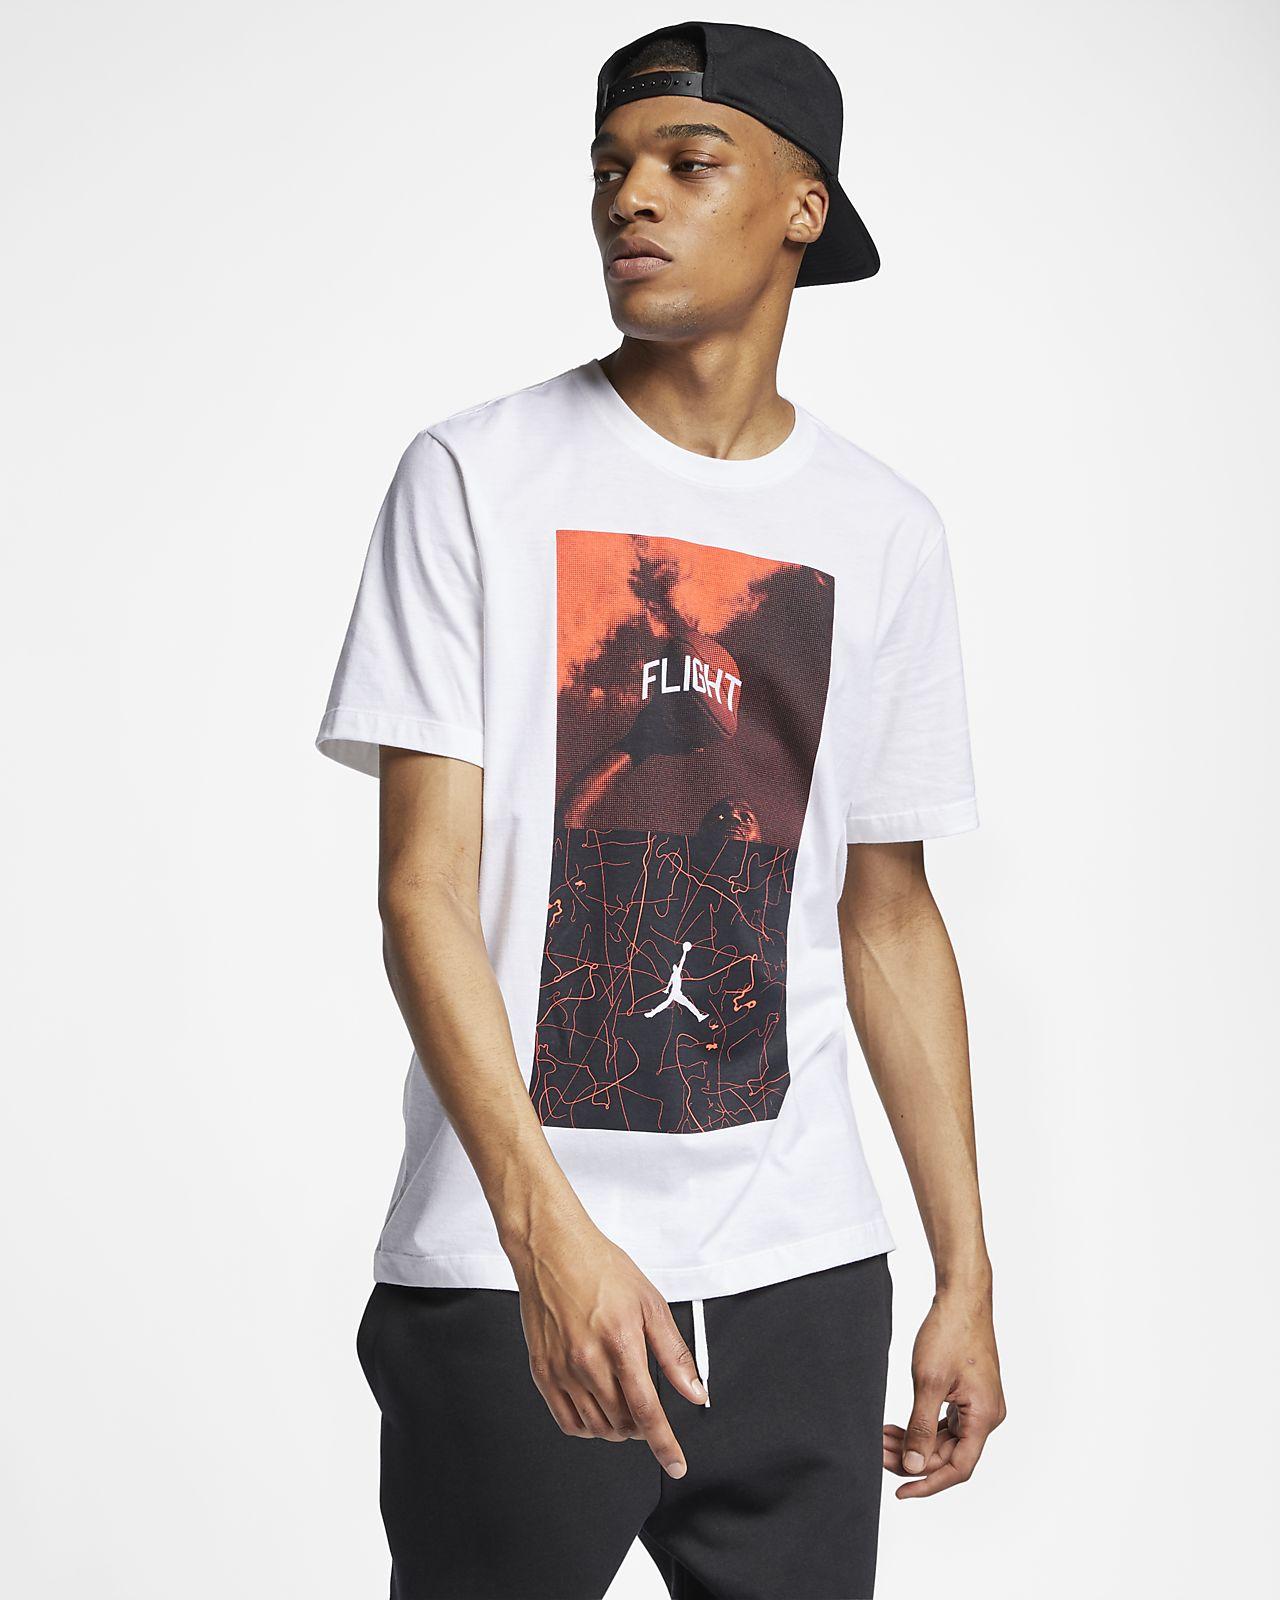 Jordan Legacy Flight Nostalgia AJ 4 Men's T-Shirt